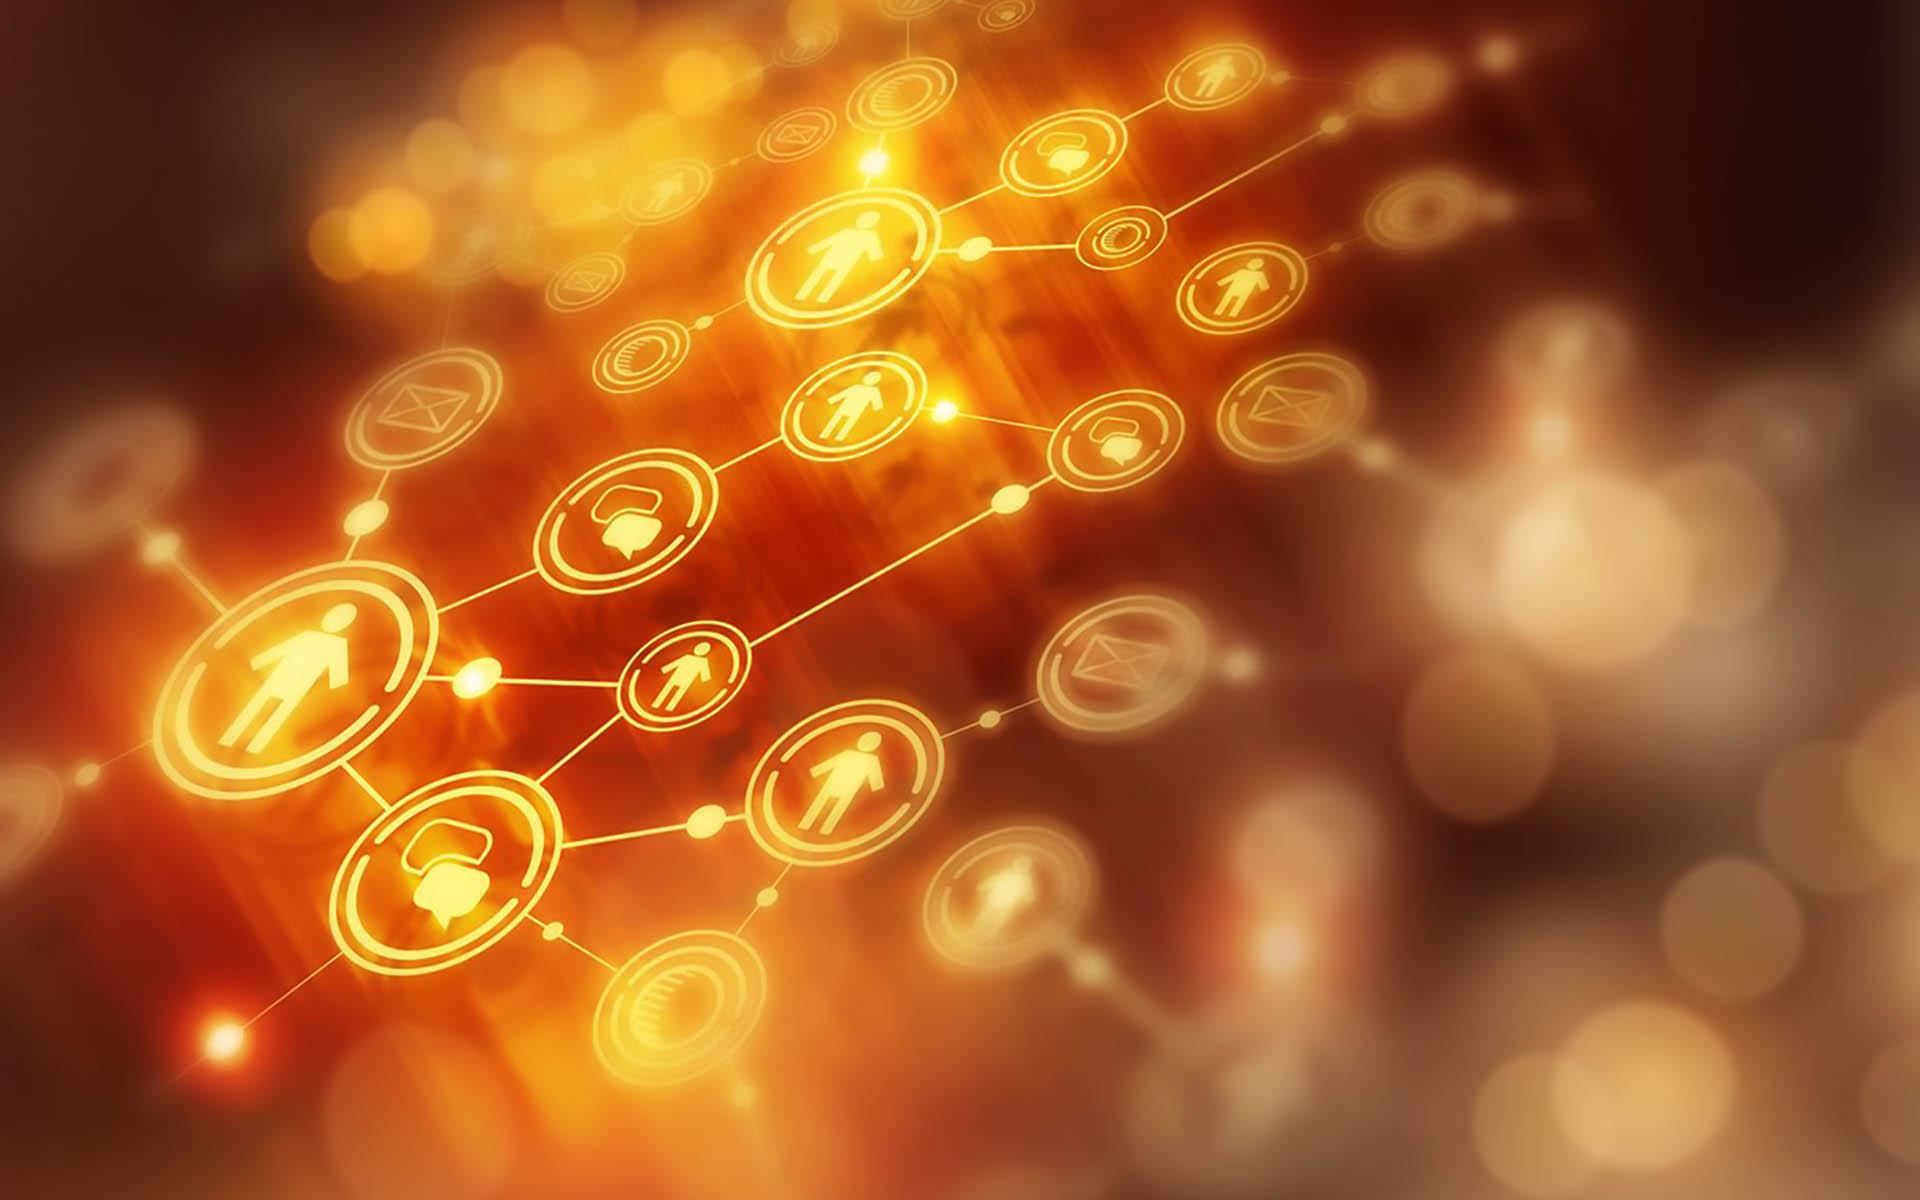 Improving Public Services Through Blockchain Technology